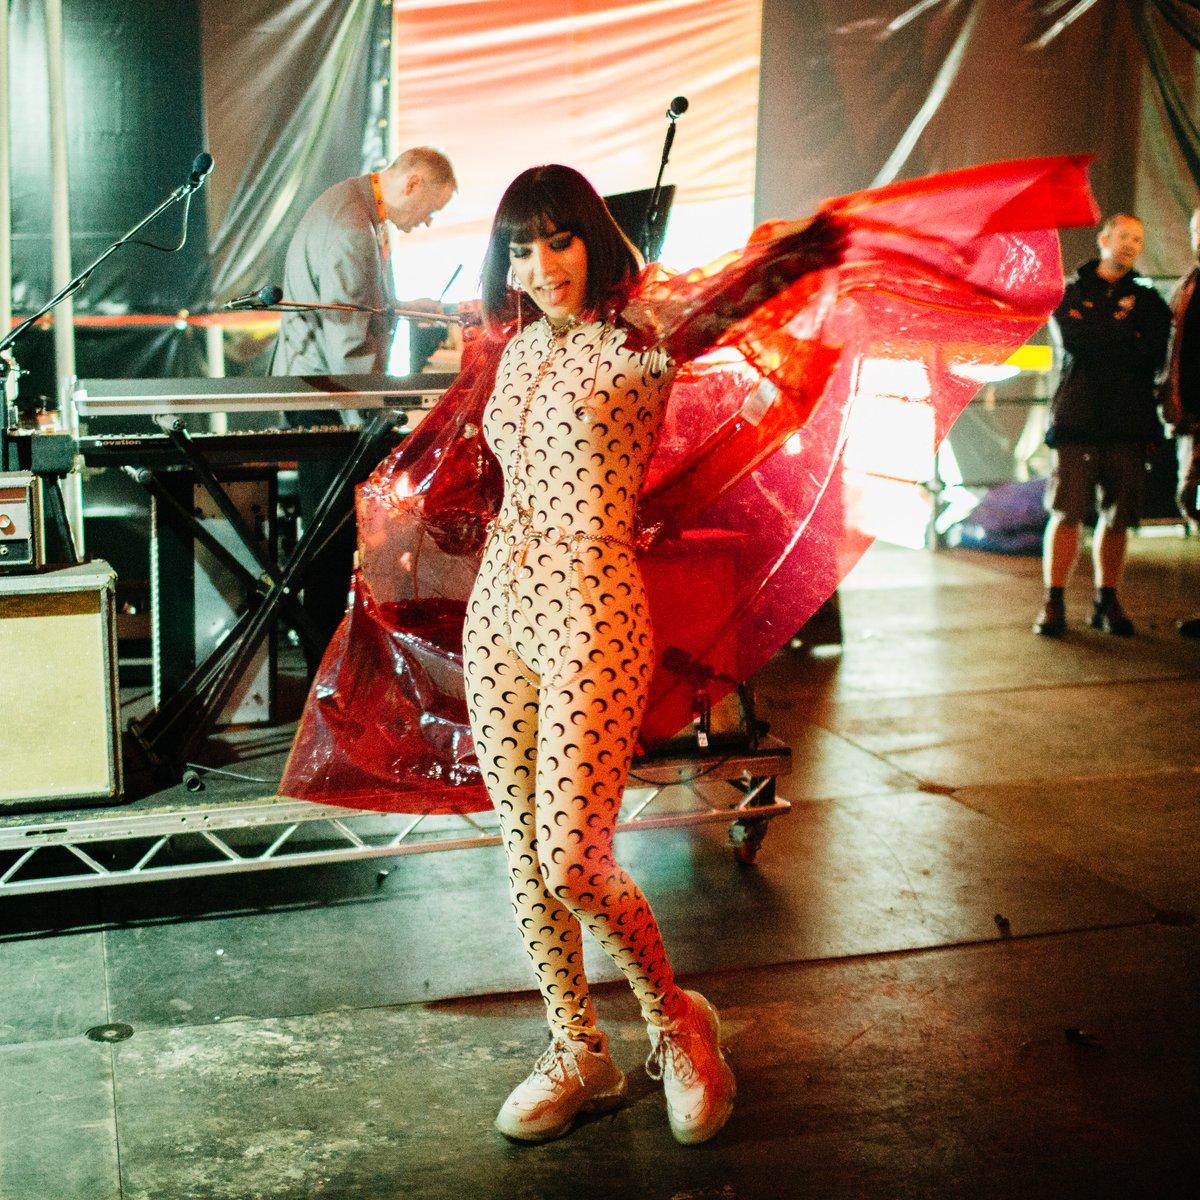 Charli XCX at BBC Radio 1's Big Weekend